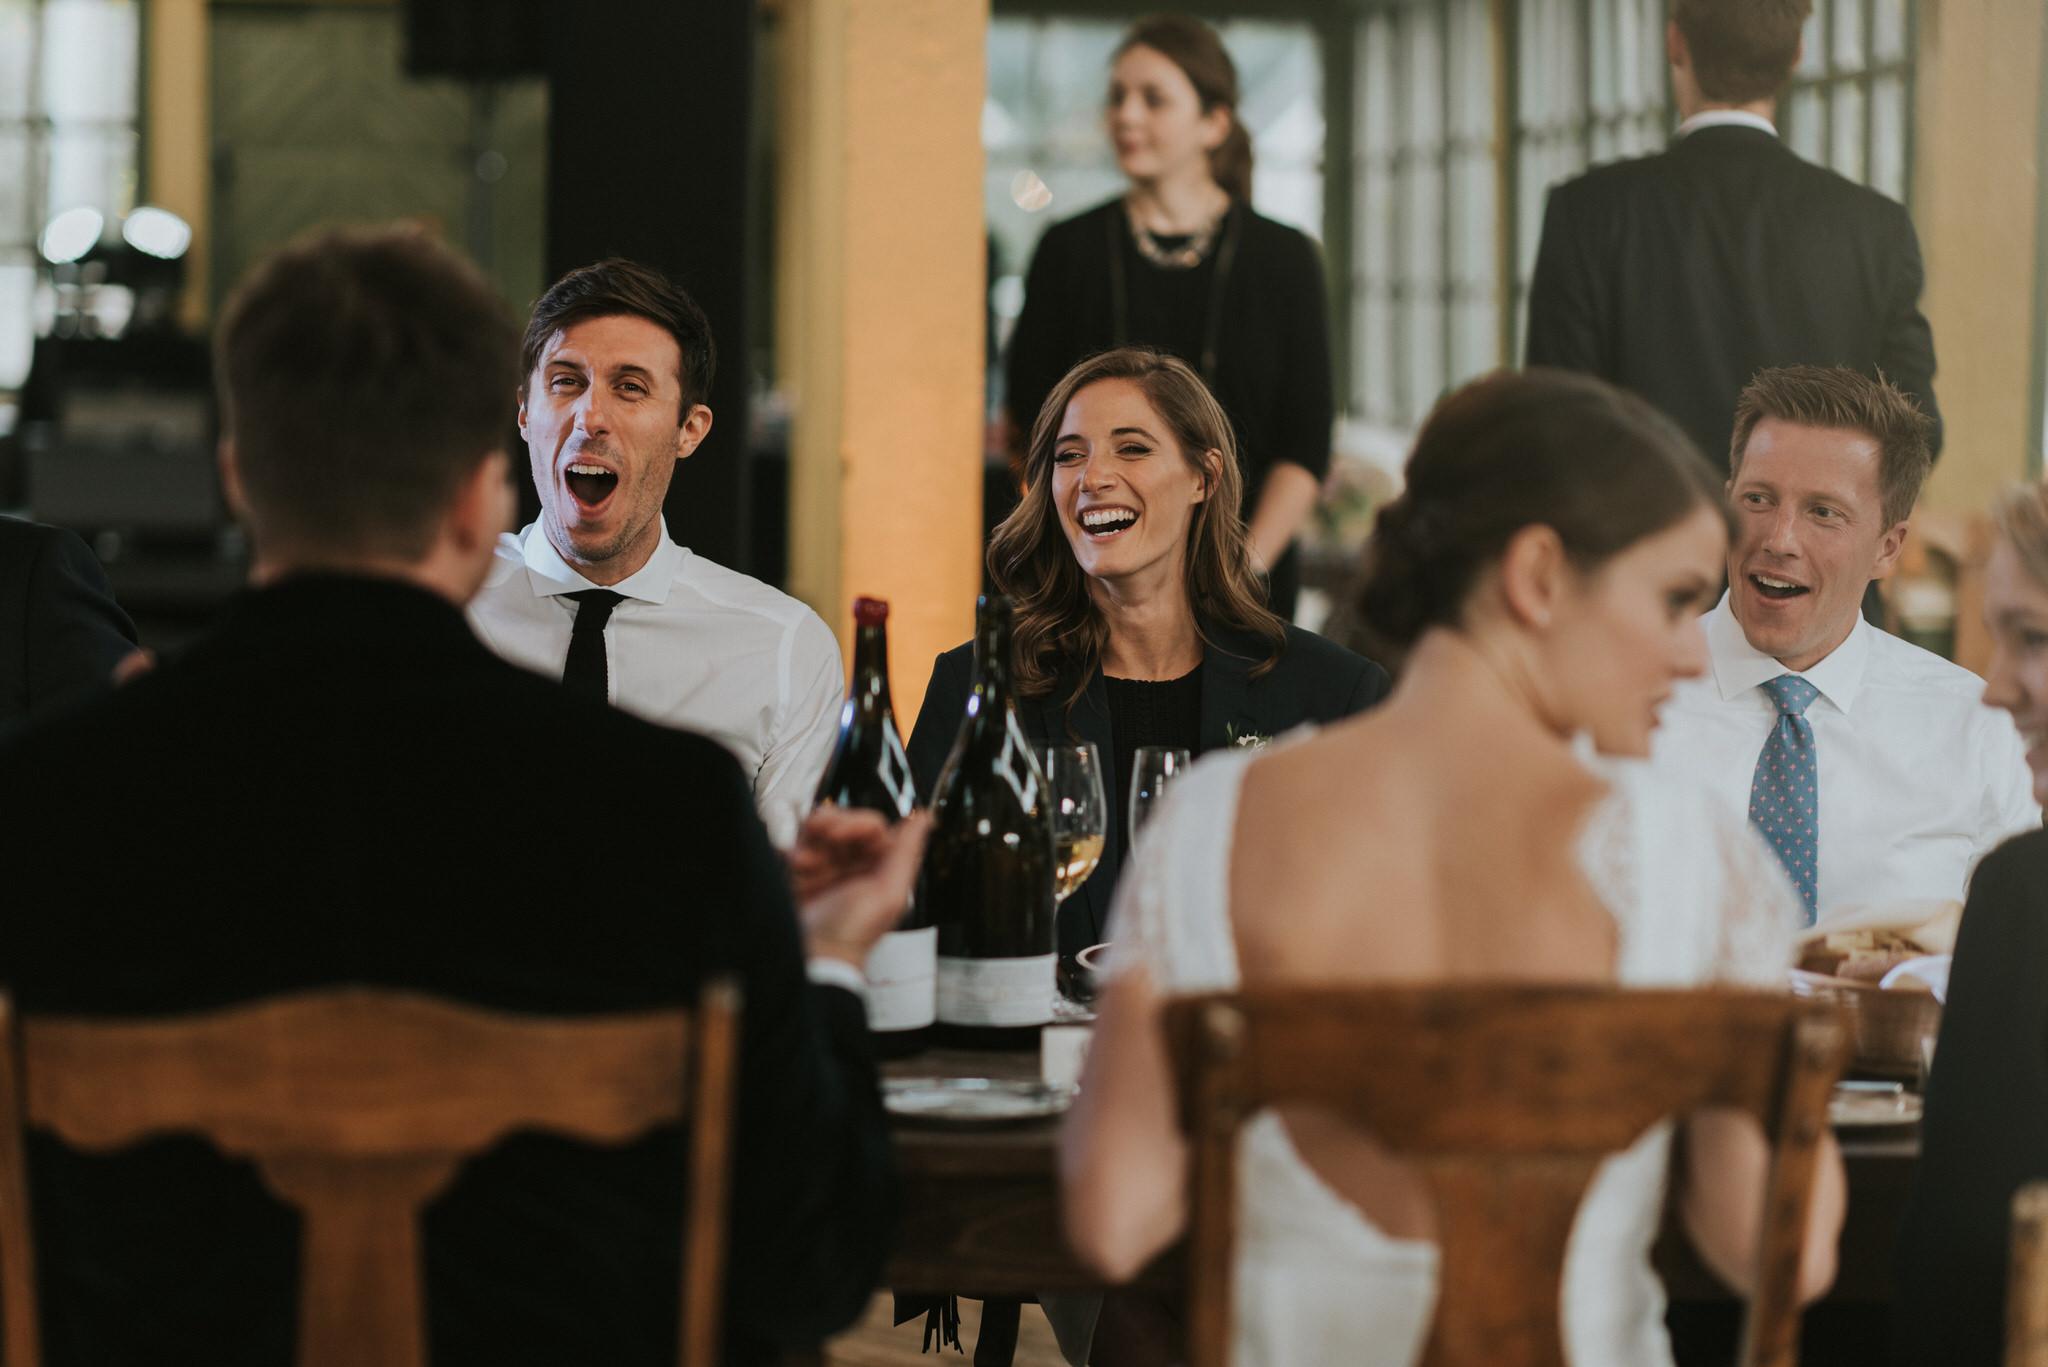 scarletoneillphotography_weddingphotography_prince edward county weddings149.JPG